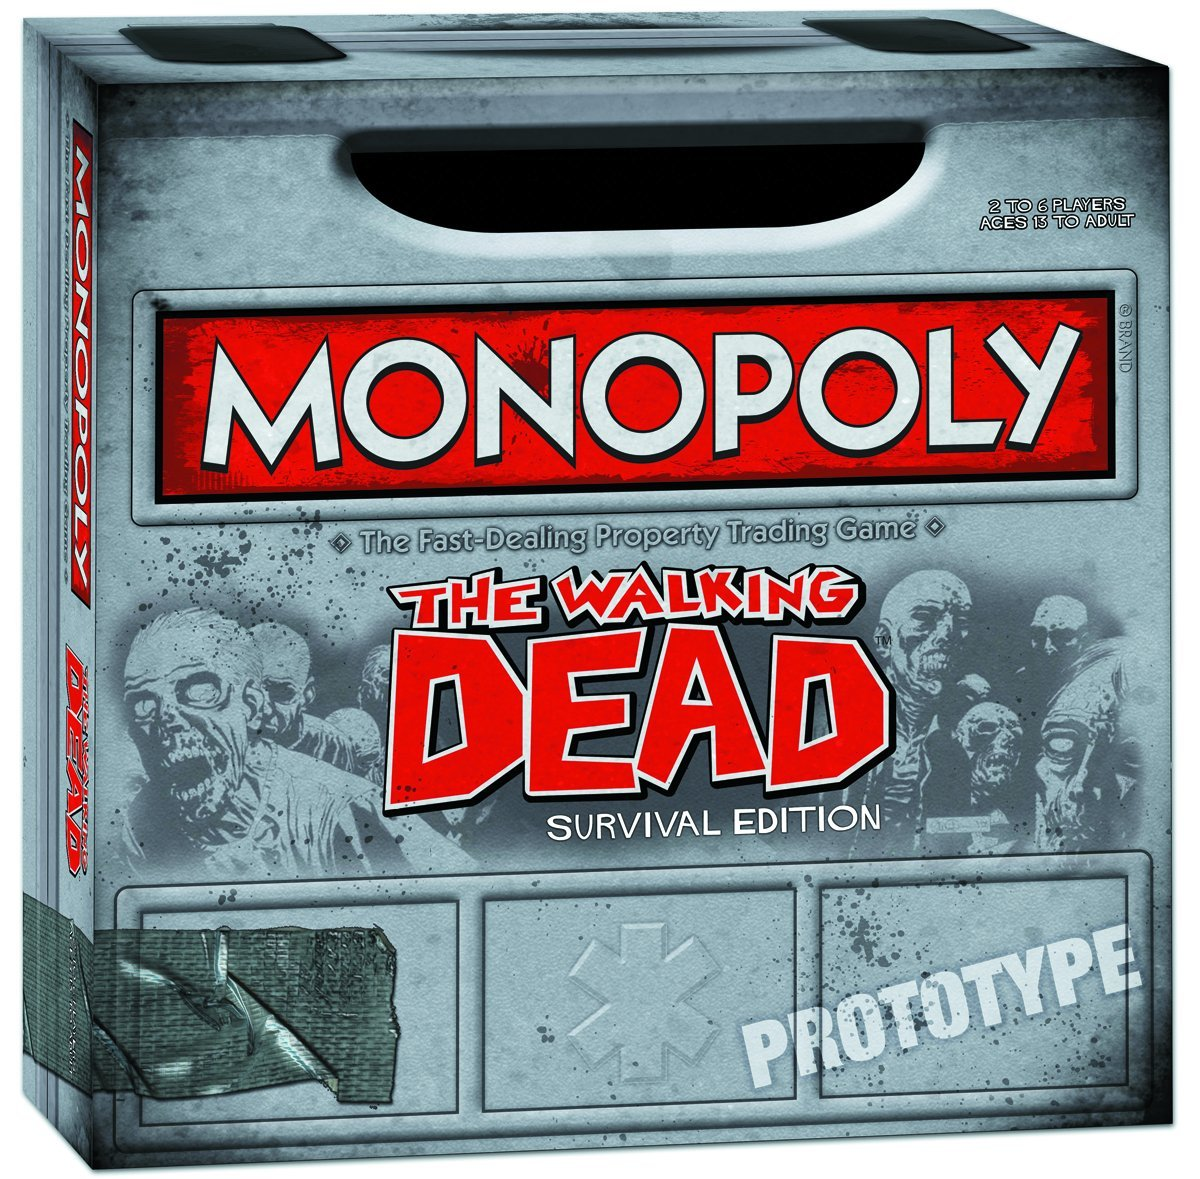 Le monopoly The Walking Dead